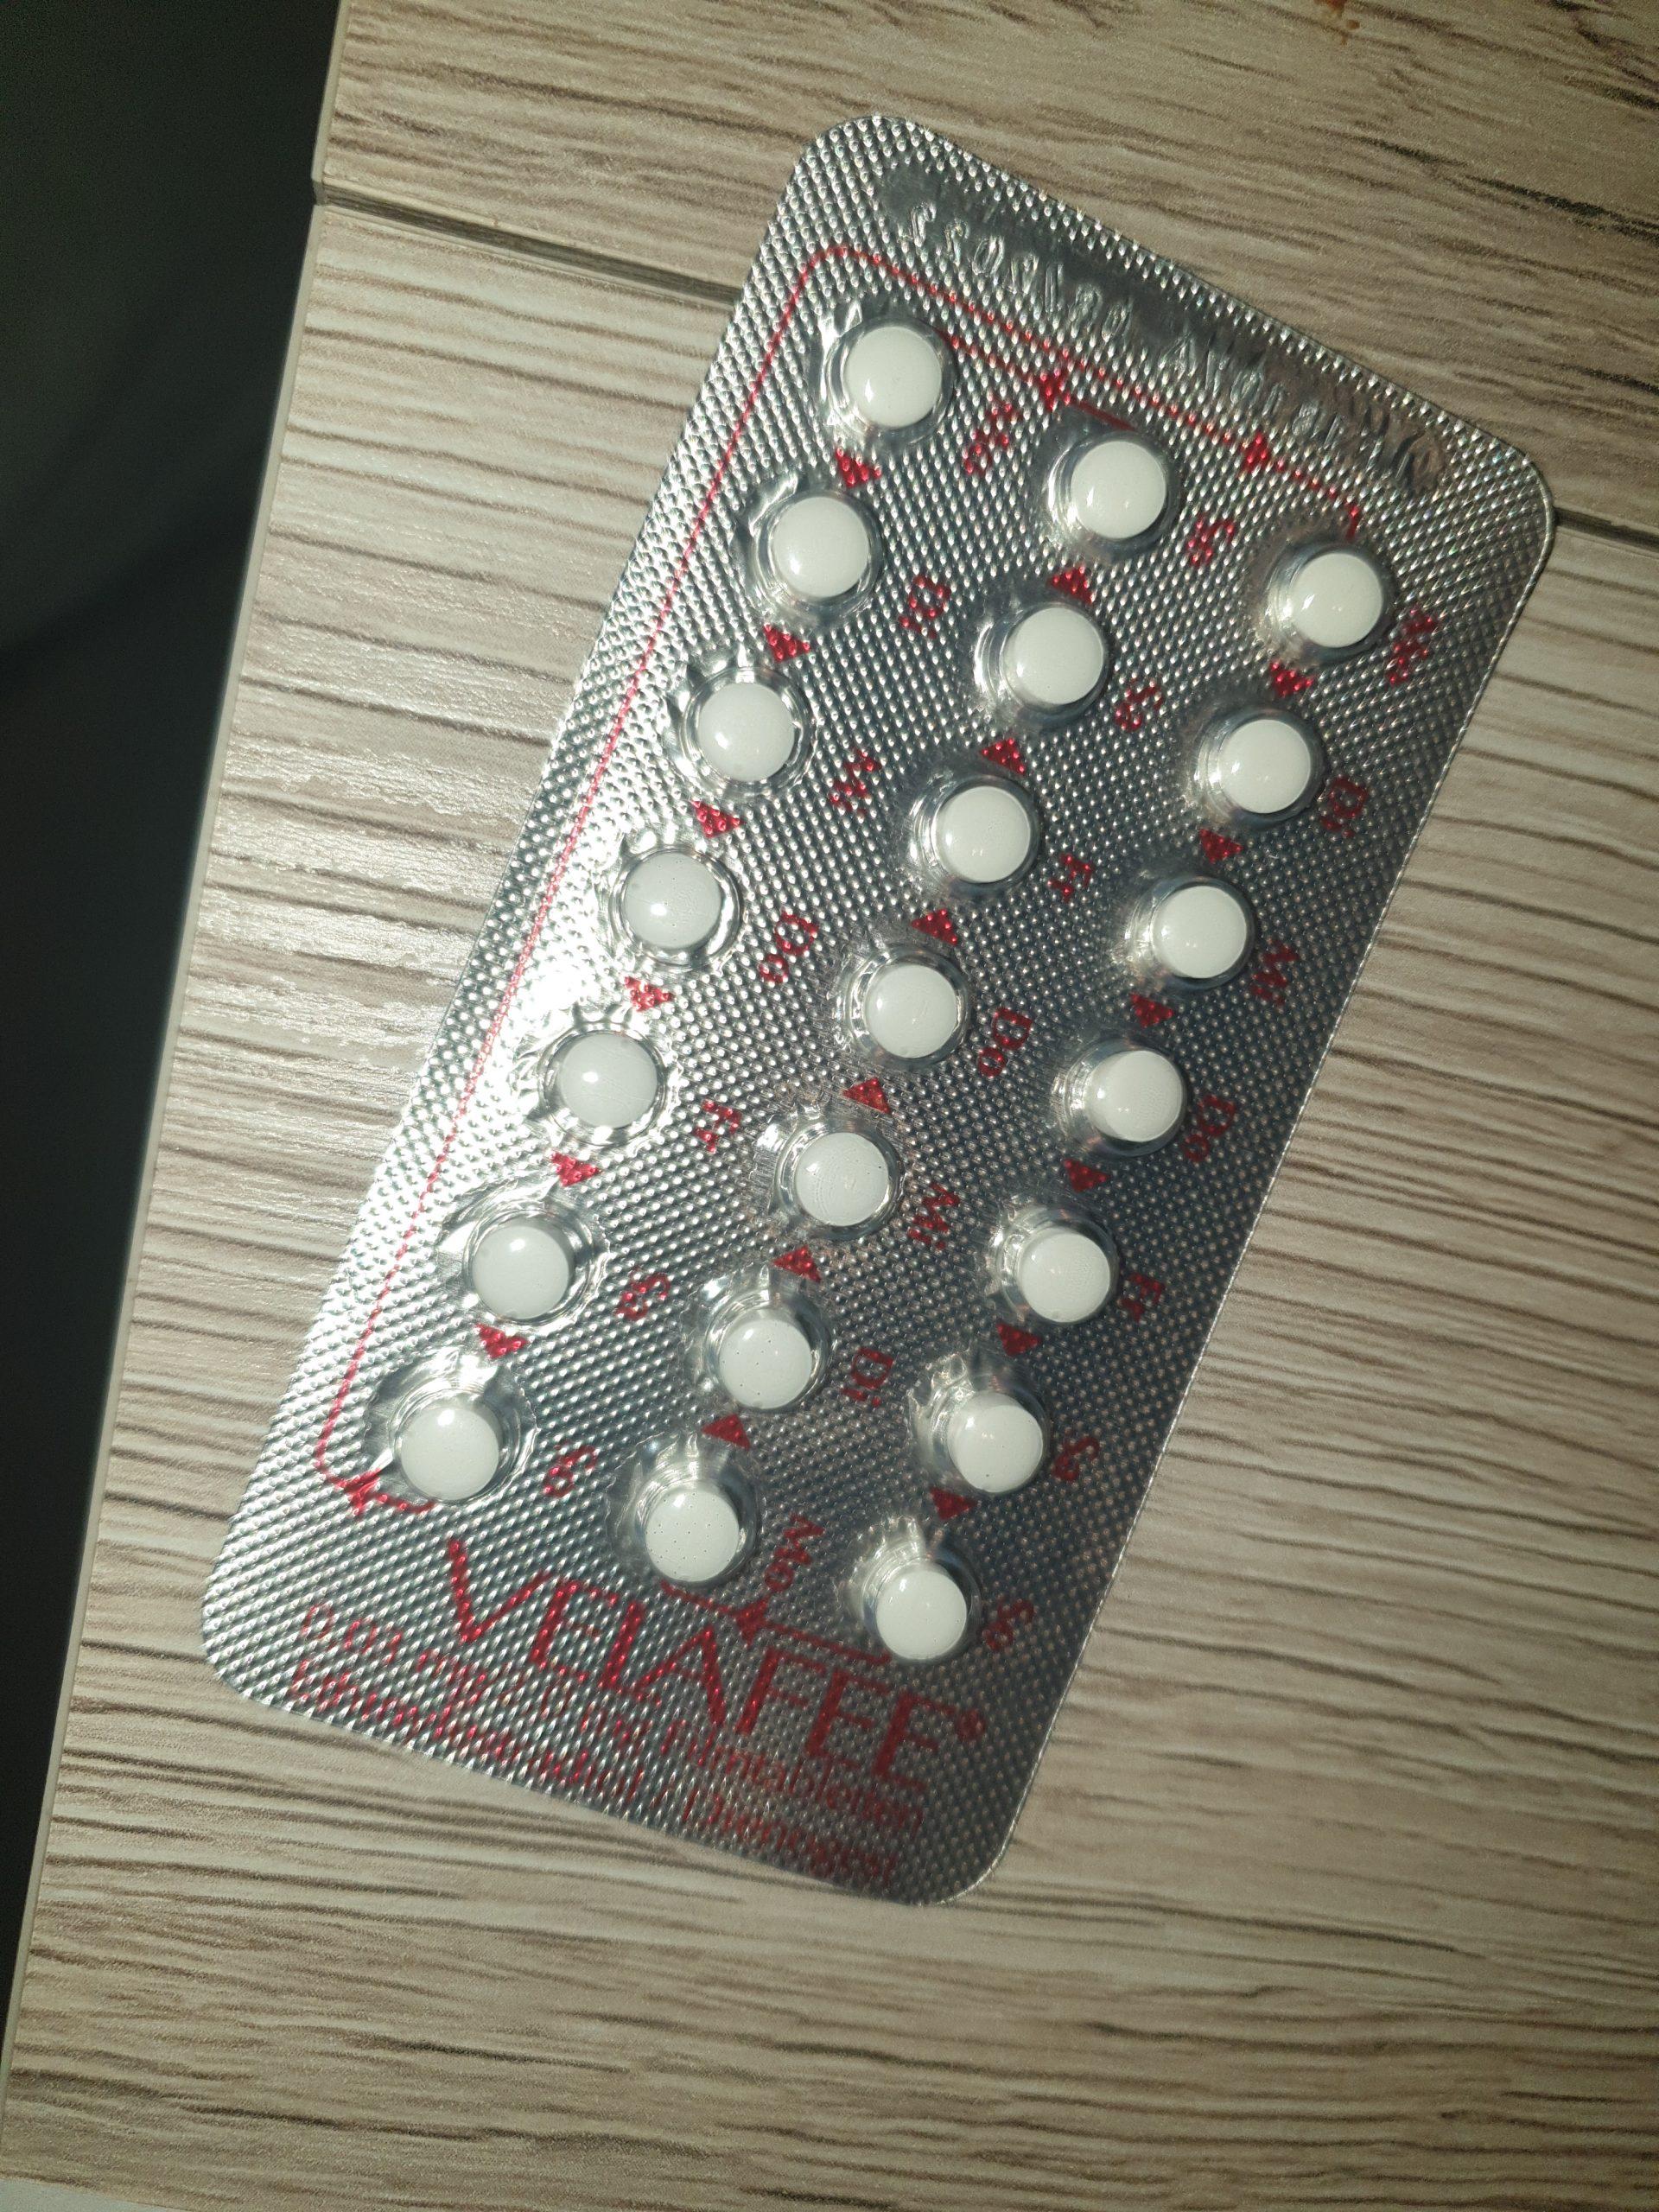 Die Pille für Sex ohne Gummi! - Lessia Mia